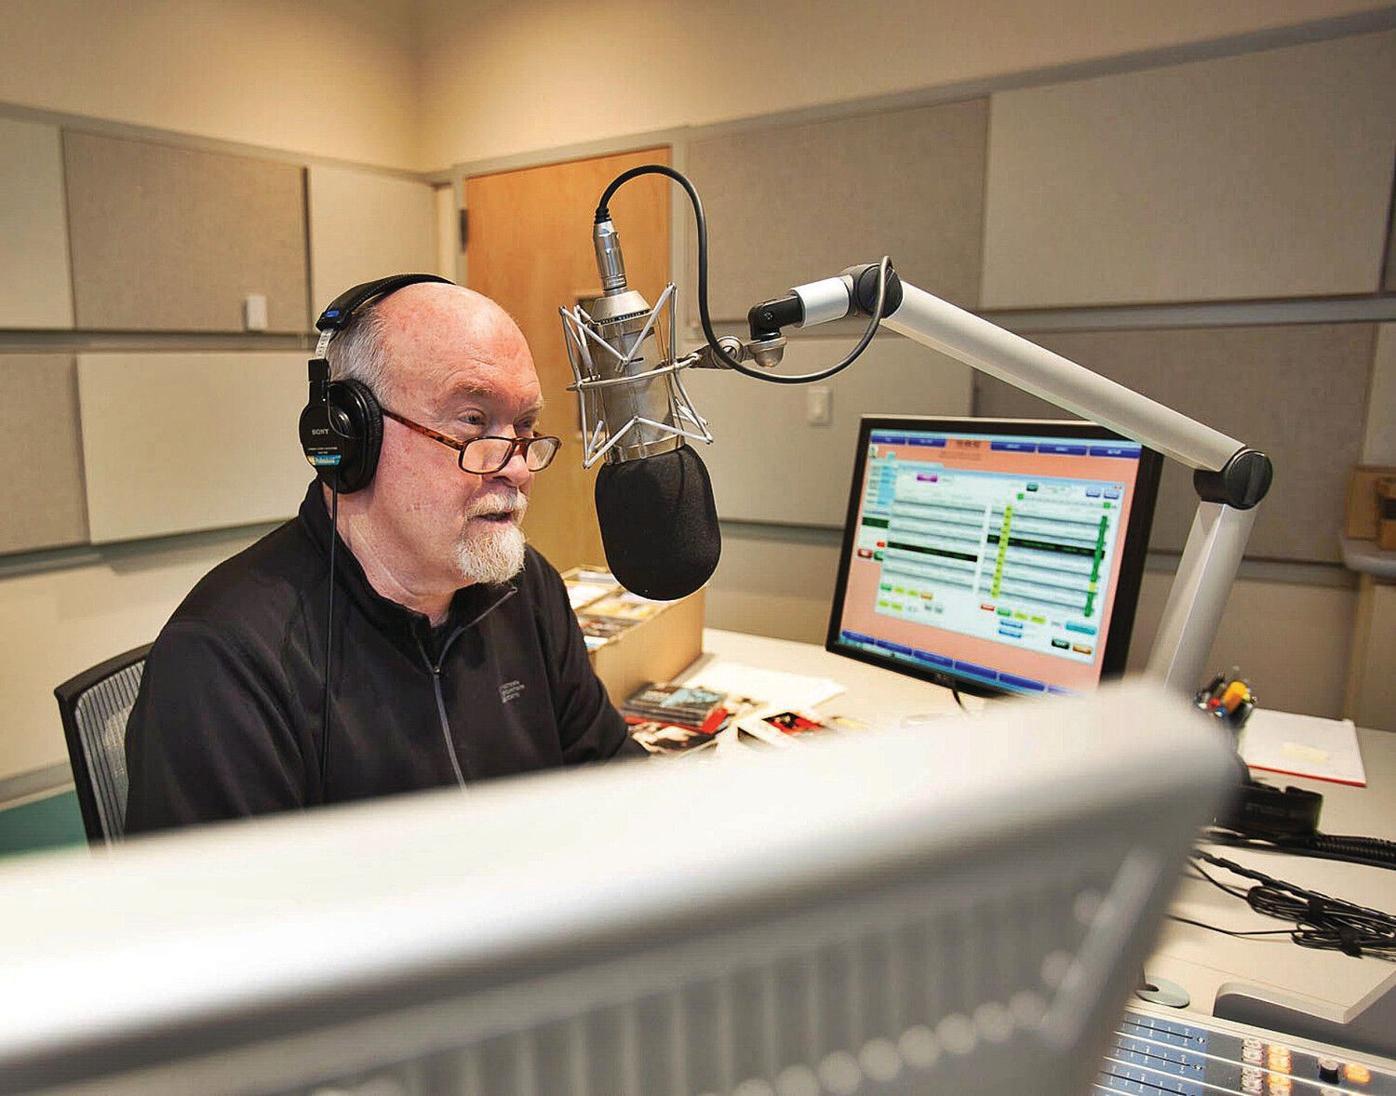 New England Public Radio: Deejay keeps jazz alive on the radio